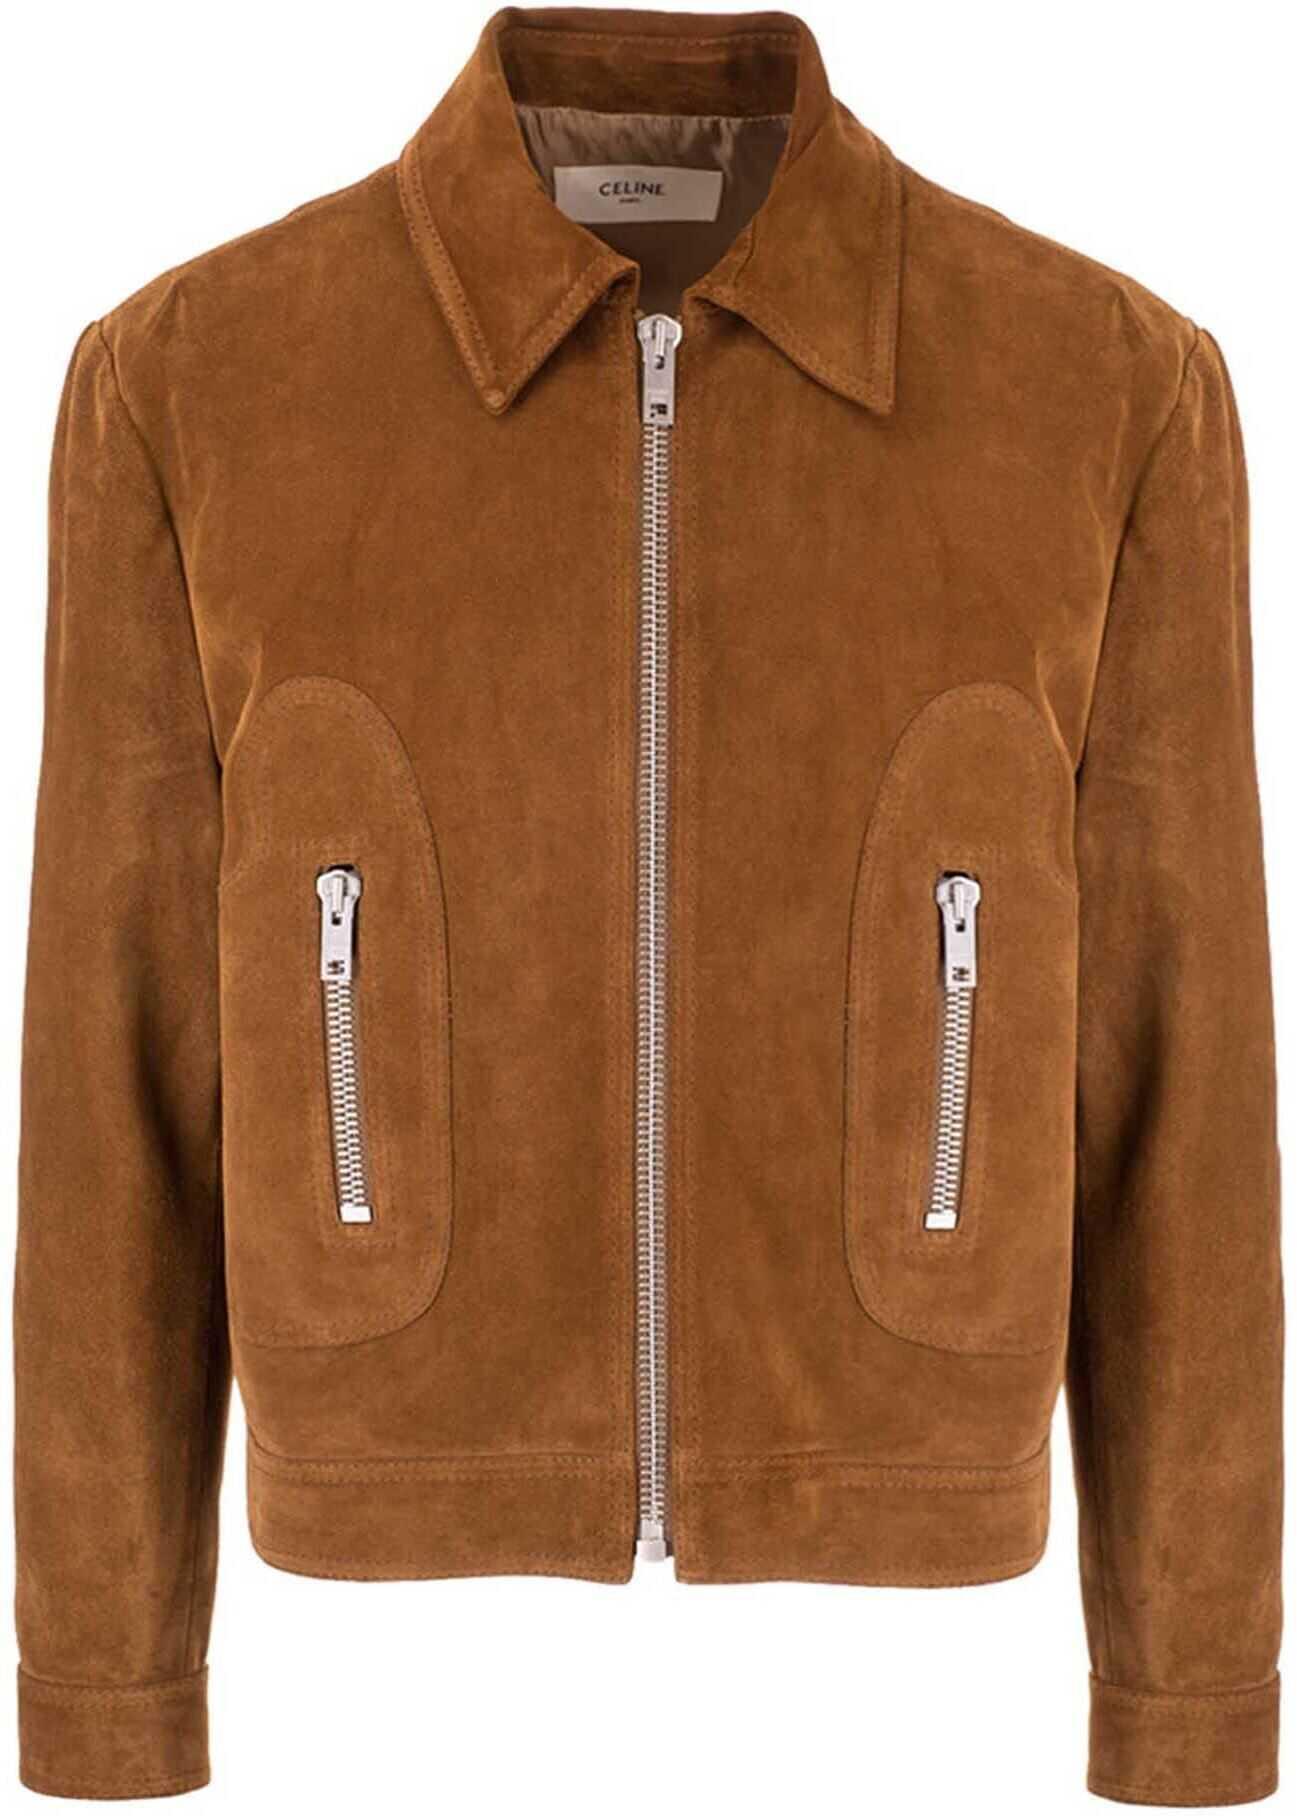 Céline 70S Straight Jacket In Brown Brown imagine